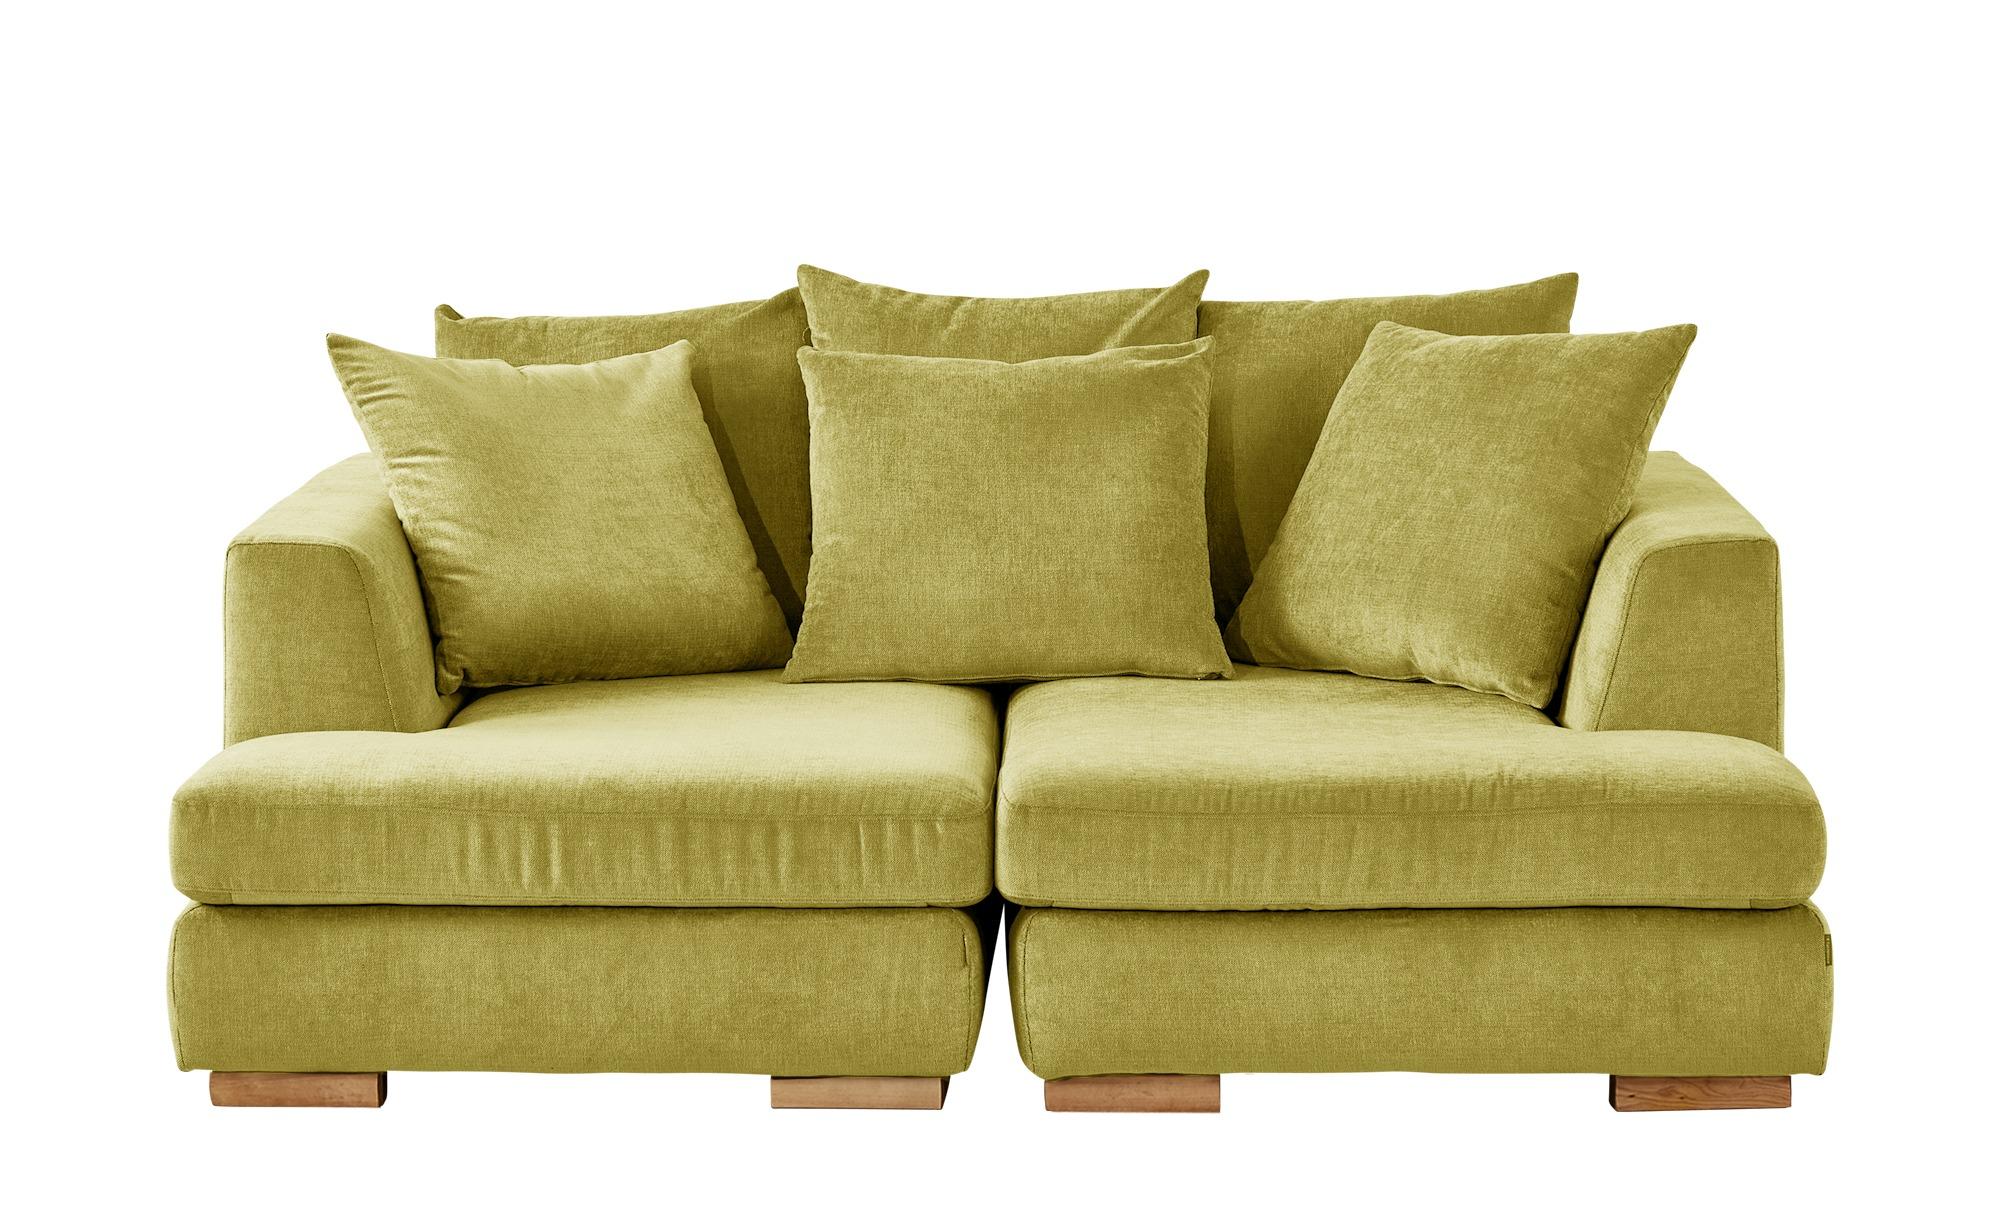 SOHO Loveseat gelb - Webstoff Paso Doble ¦ gelb ¦ Maße (cm): B: 202 H: 80 T: 156 Polstermöbel > Sofas > 2-Sitzer - Höffner